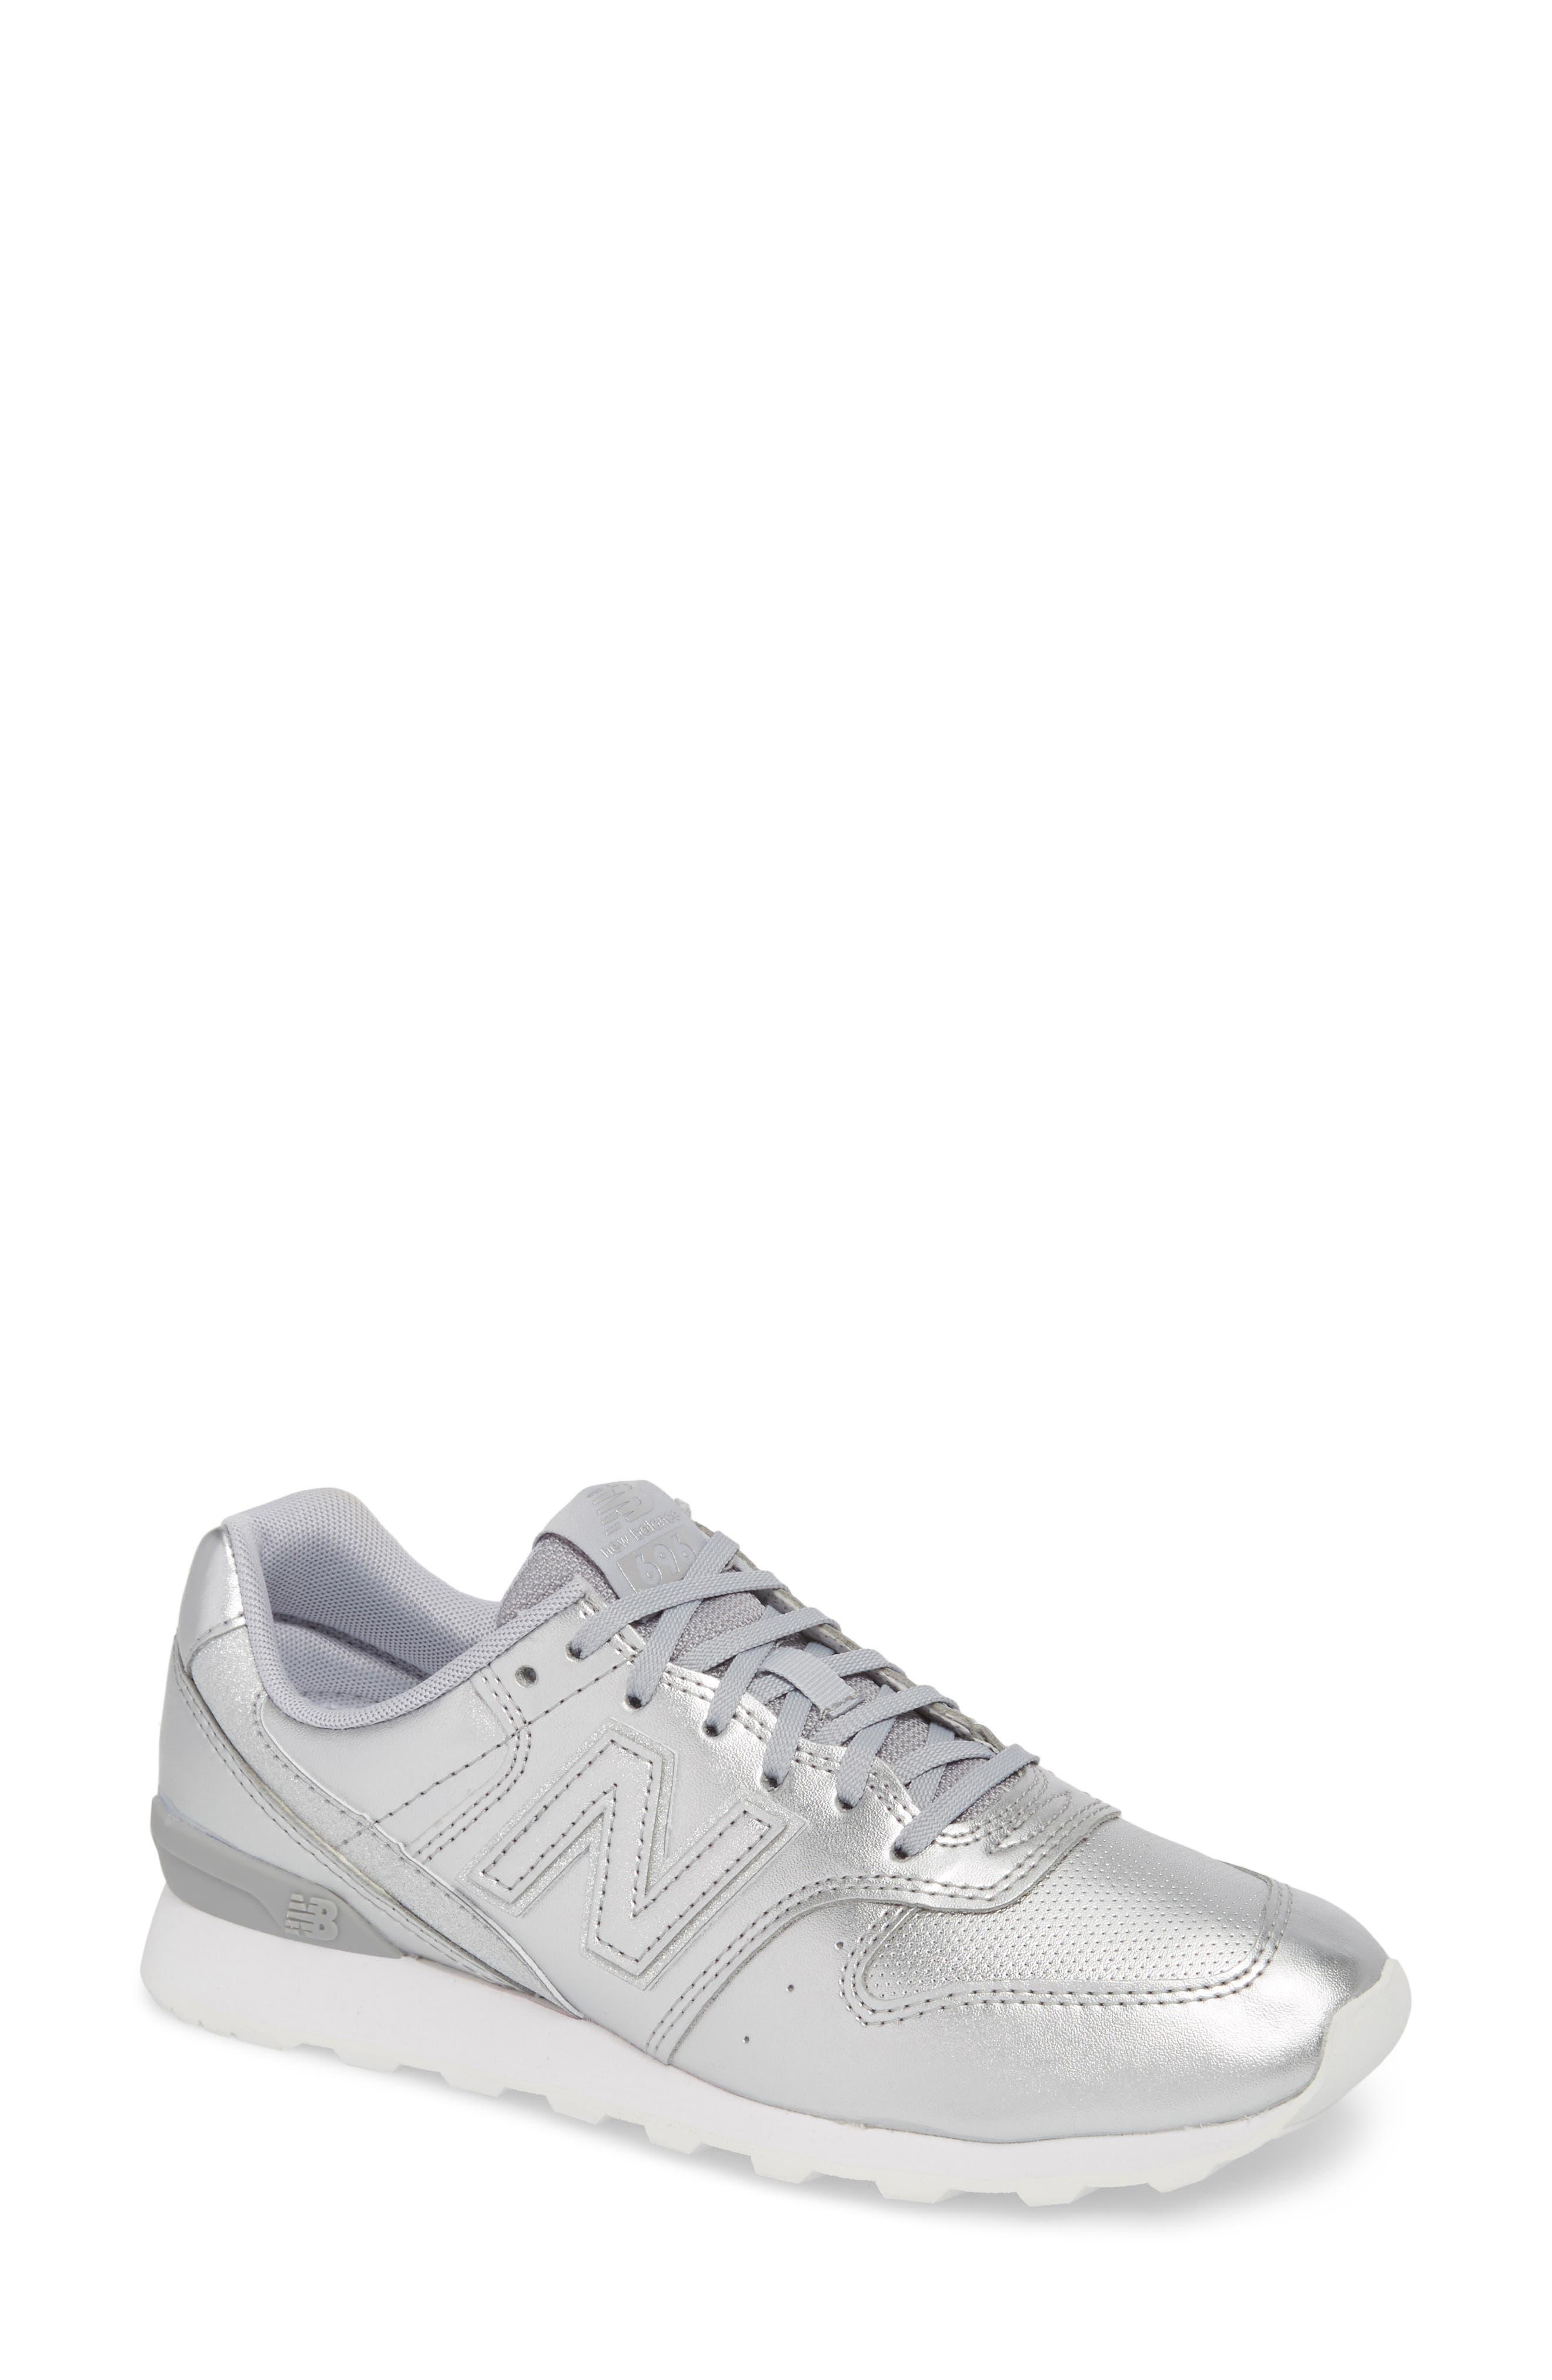 696 Sneaker,                             Main thumbnail 1, color,                             Metallic Silver